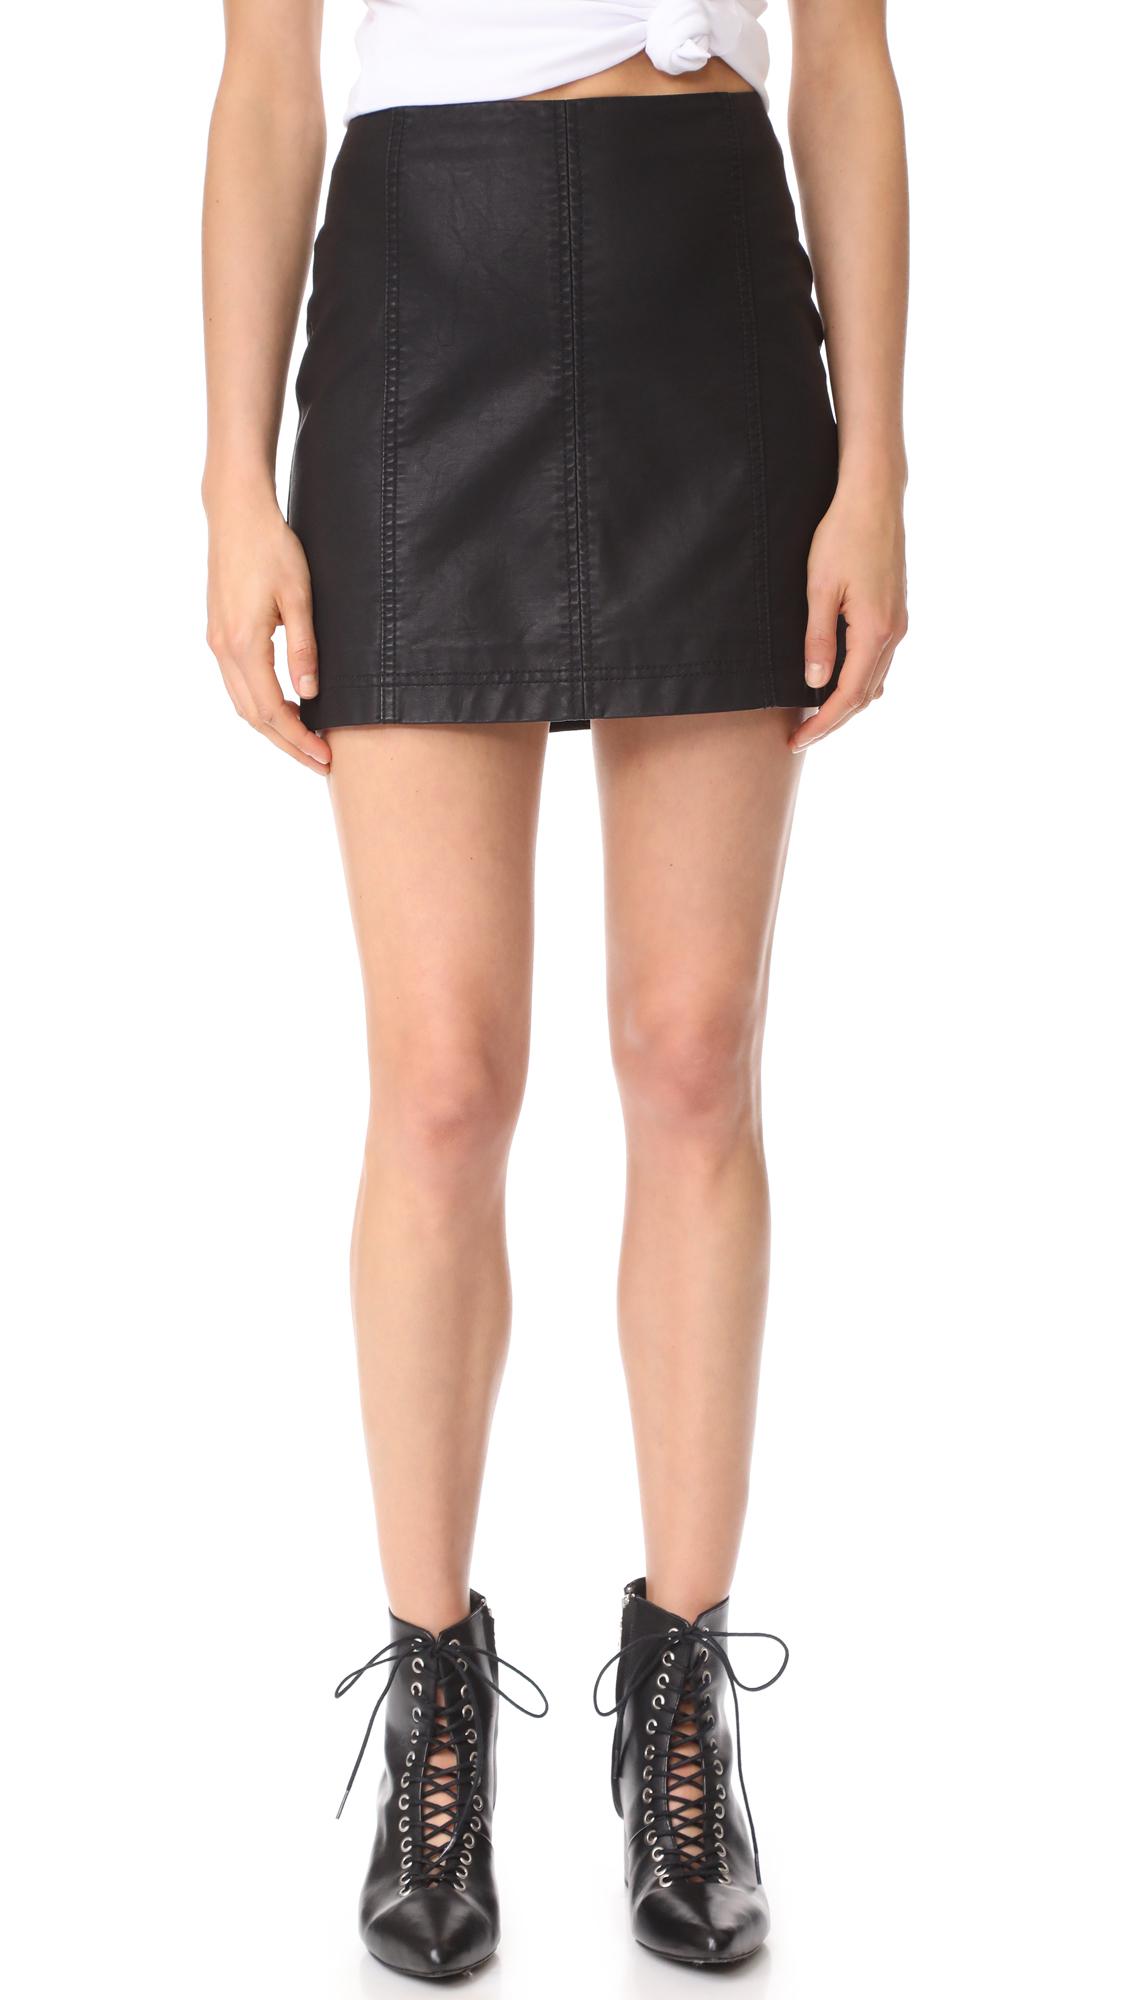 Free People Modern Femme Vegan Miniskirt - Black